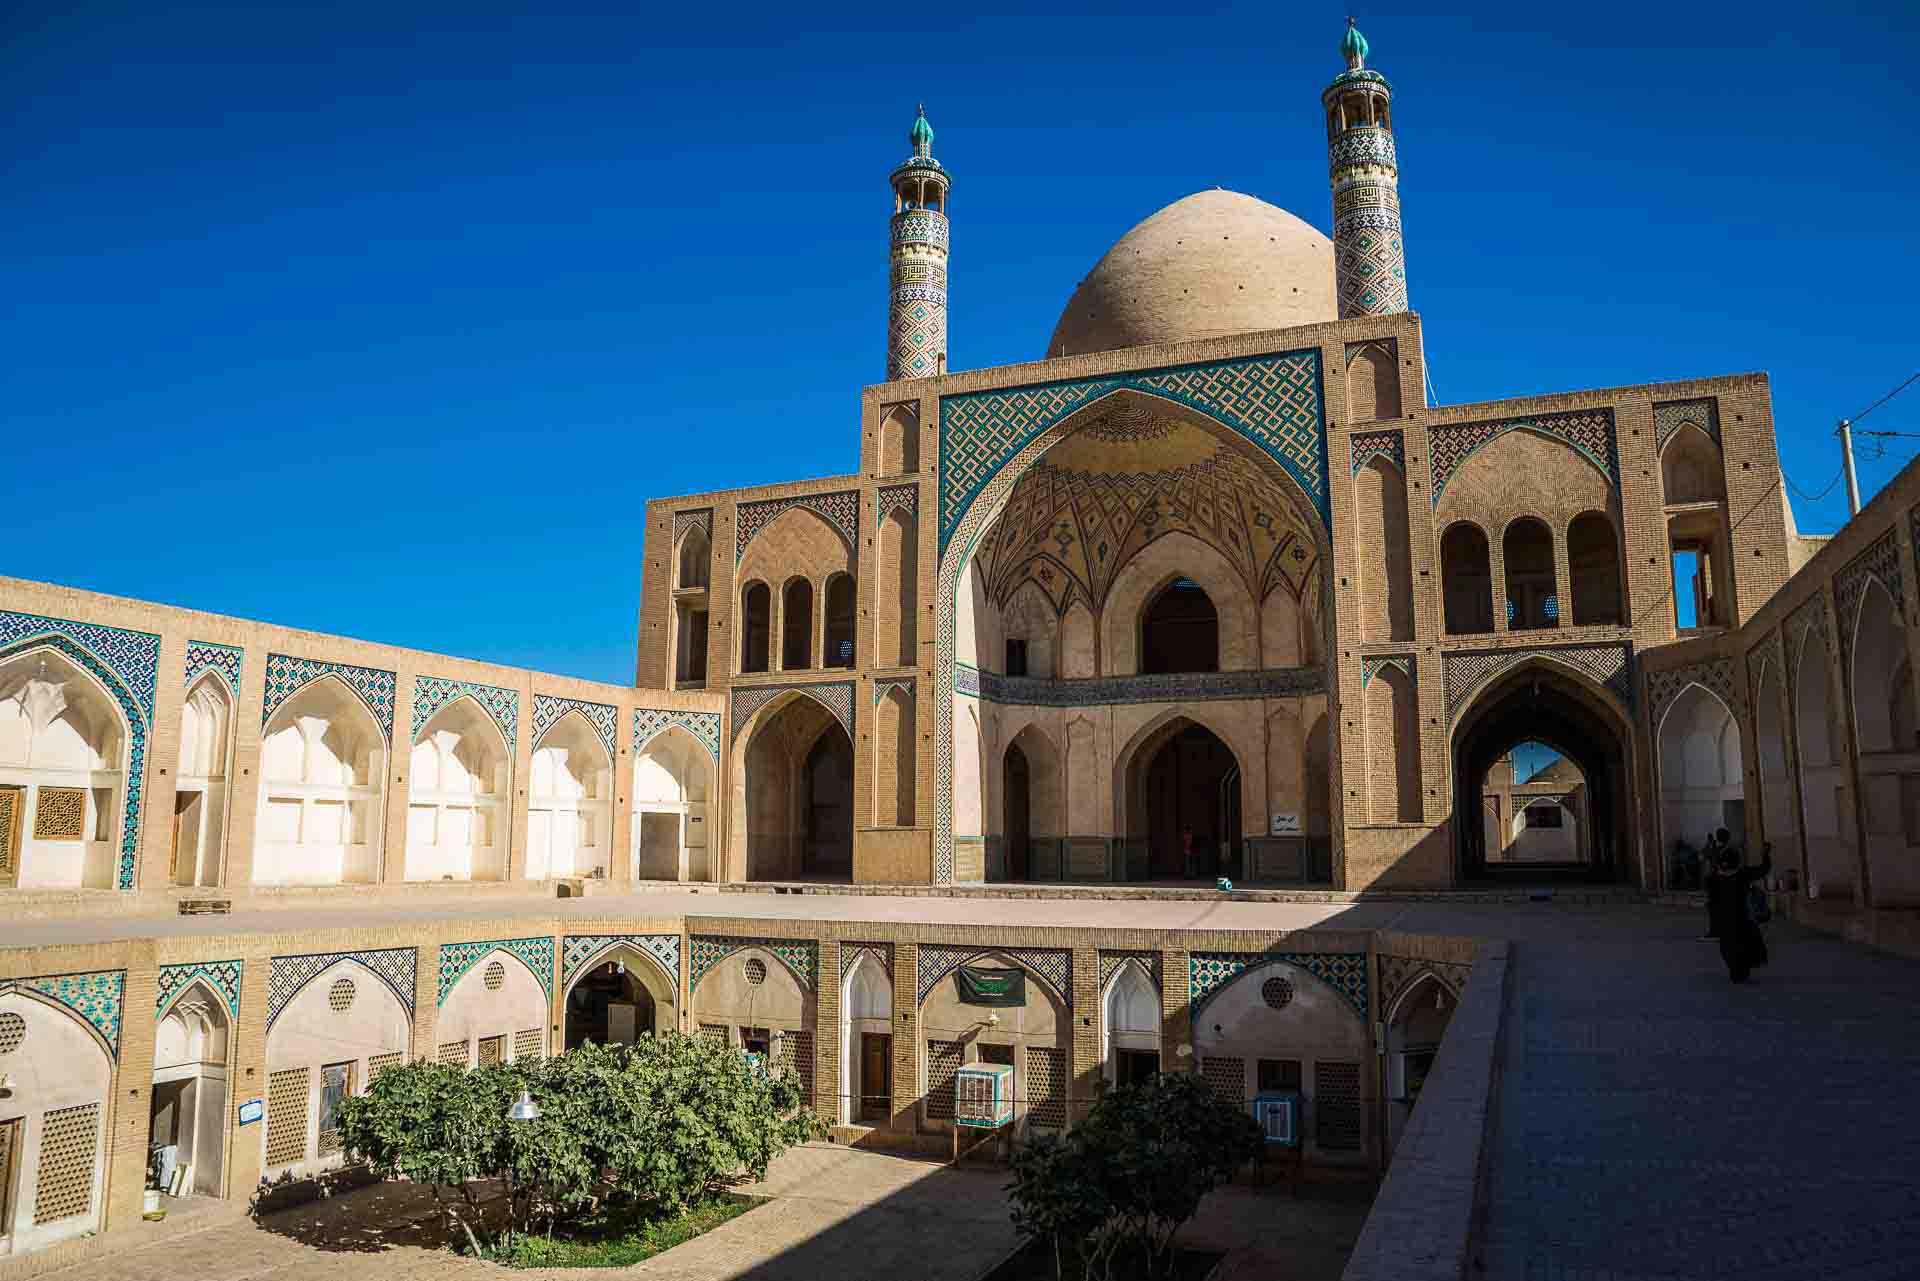 Agha Bozorg mosque, kashan, iran, pescart, photo blog, travel blog, blog, photo travel blog, enrico pescantini, pescantini